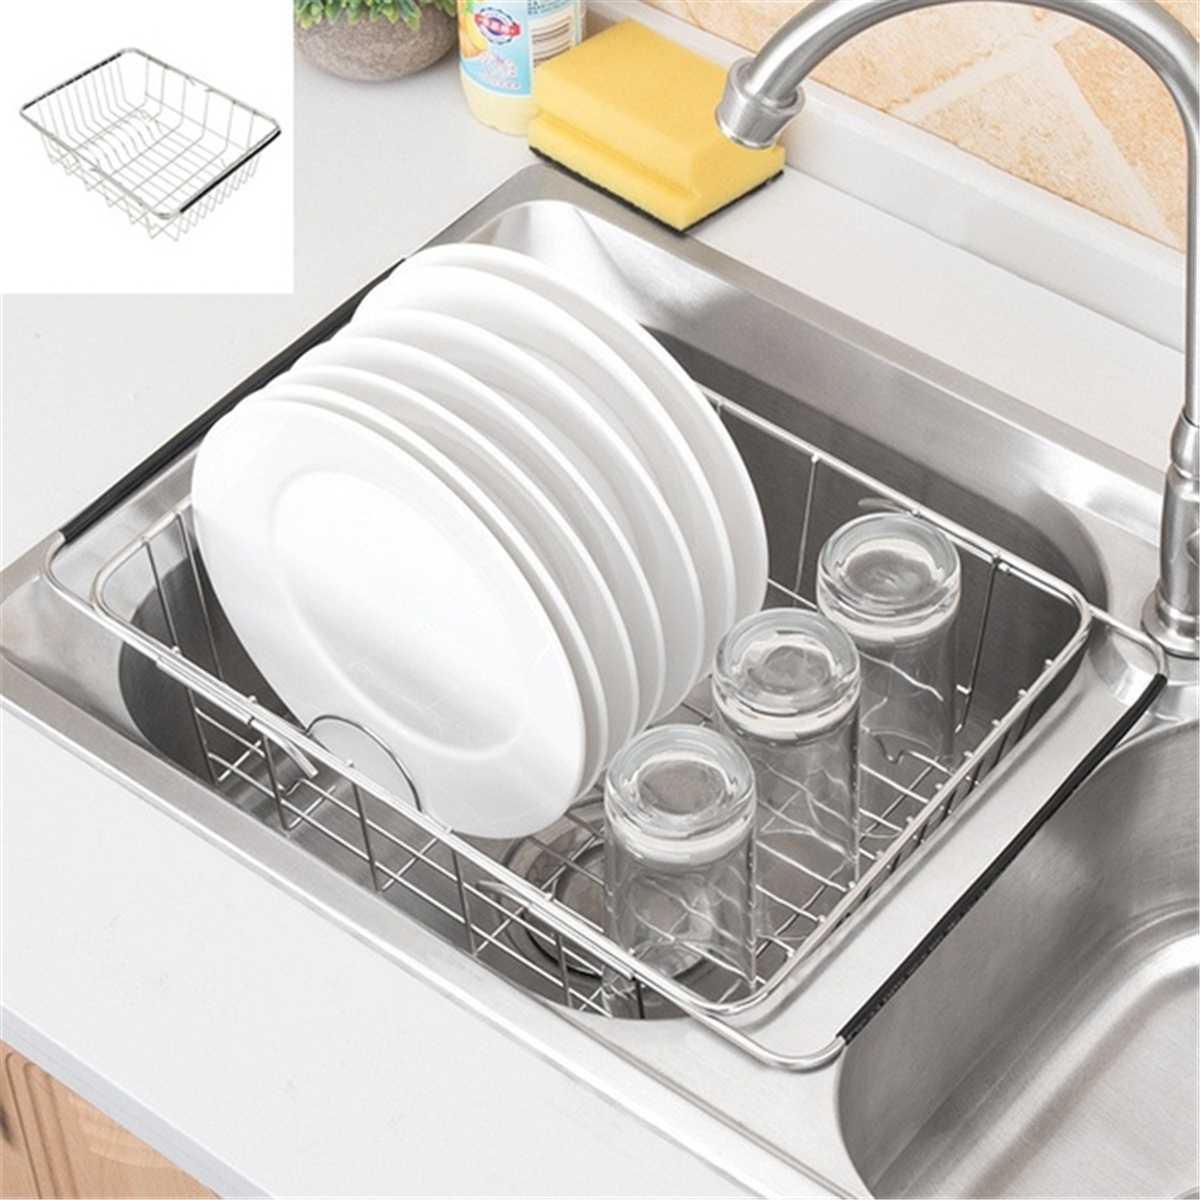 Adjustable Over Sink Dish Drying Rack Stainless Steel Kitchen Storage Basket Drain Holder Fruit Rustproof Bowl Dish Glass Rack